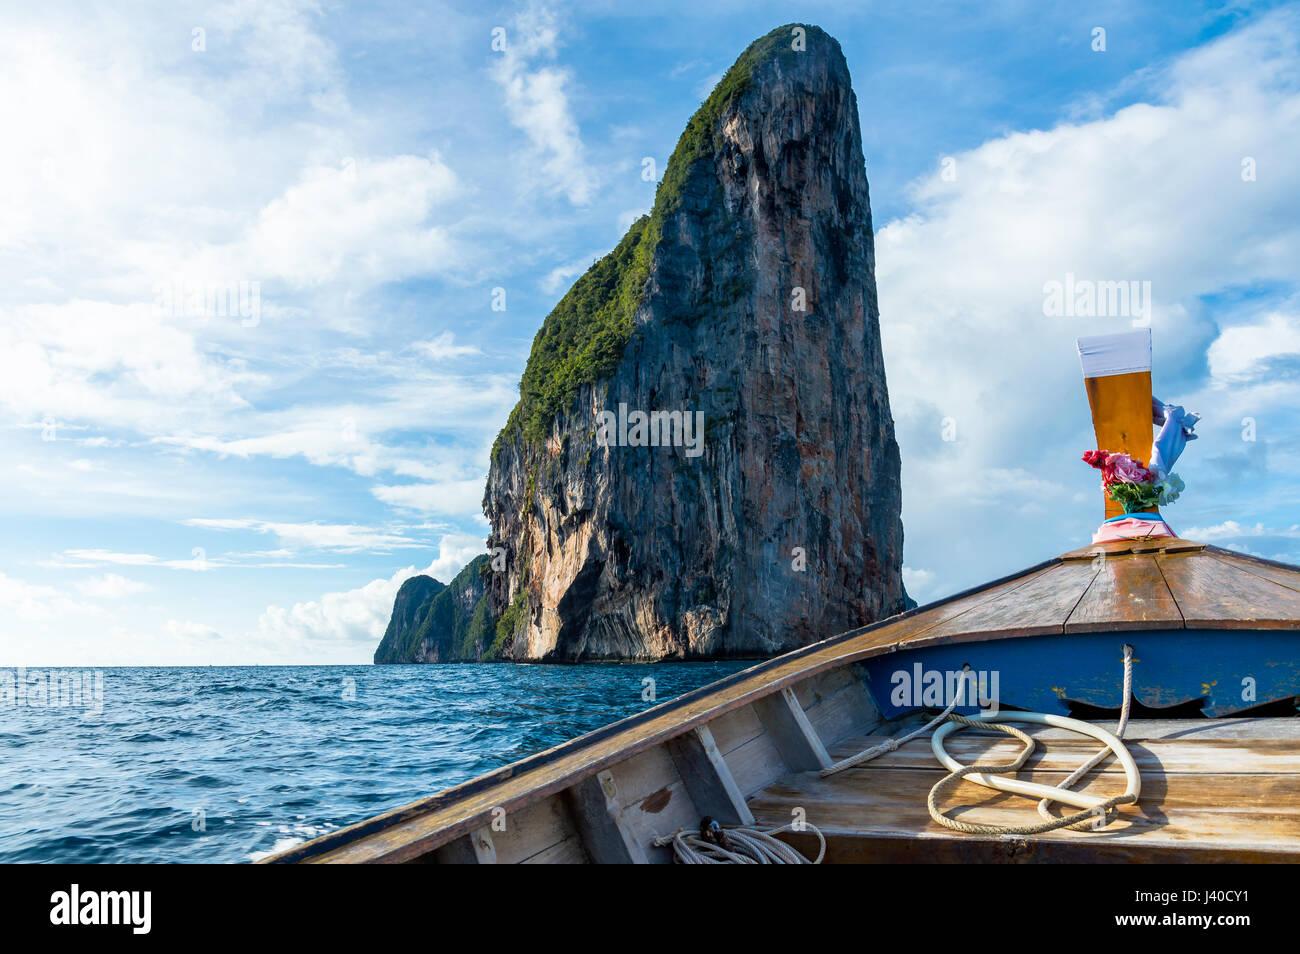 Longtail-Boot im Meer gegen blauen Himmel und Insel Stockfoto